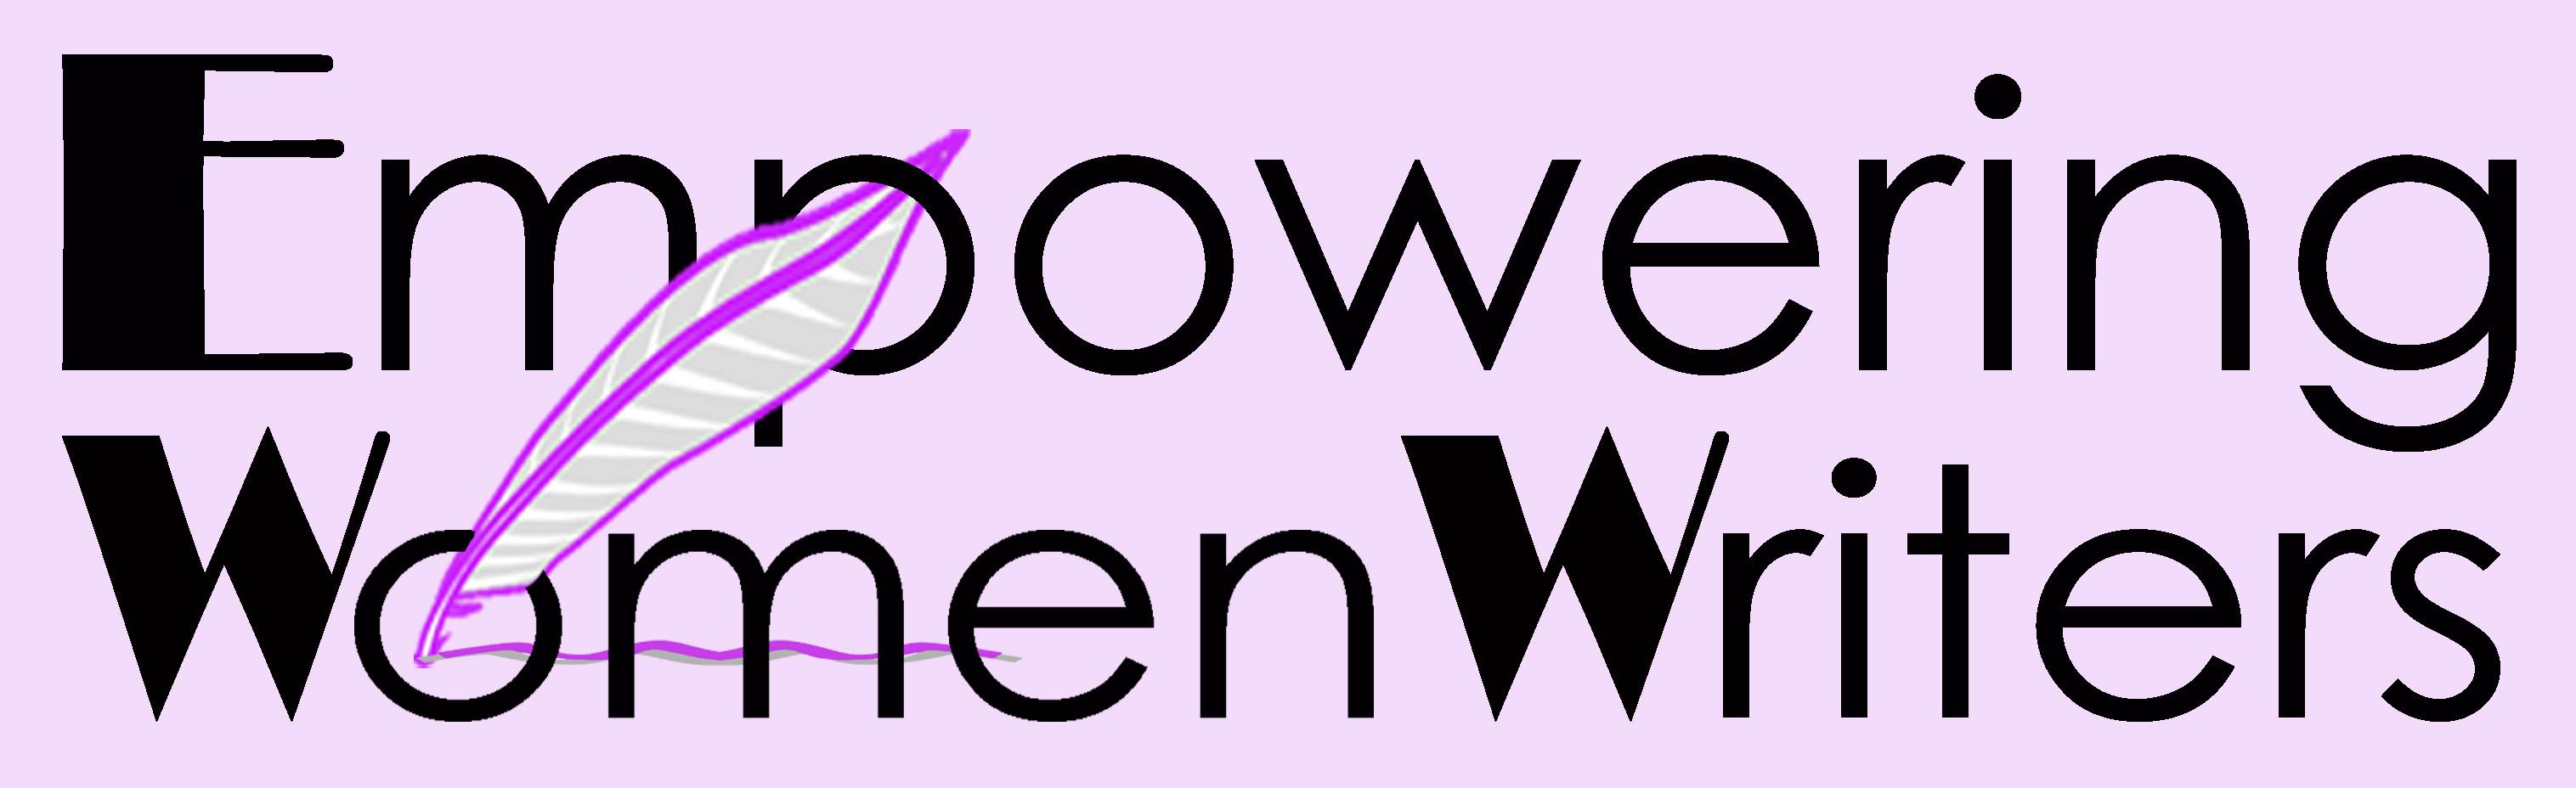 Empowering Women Writers